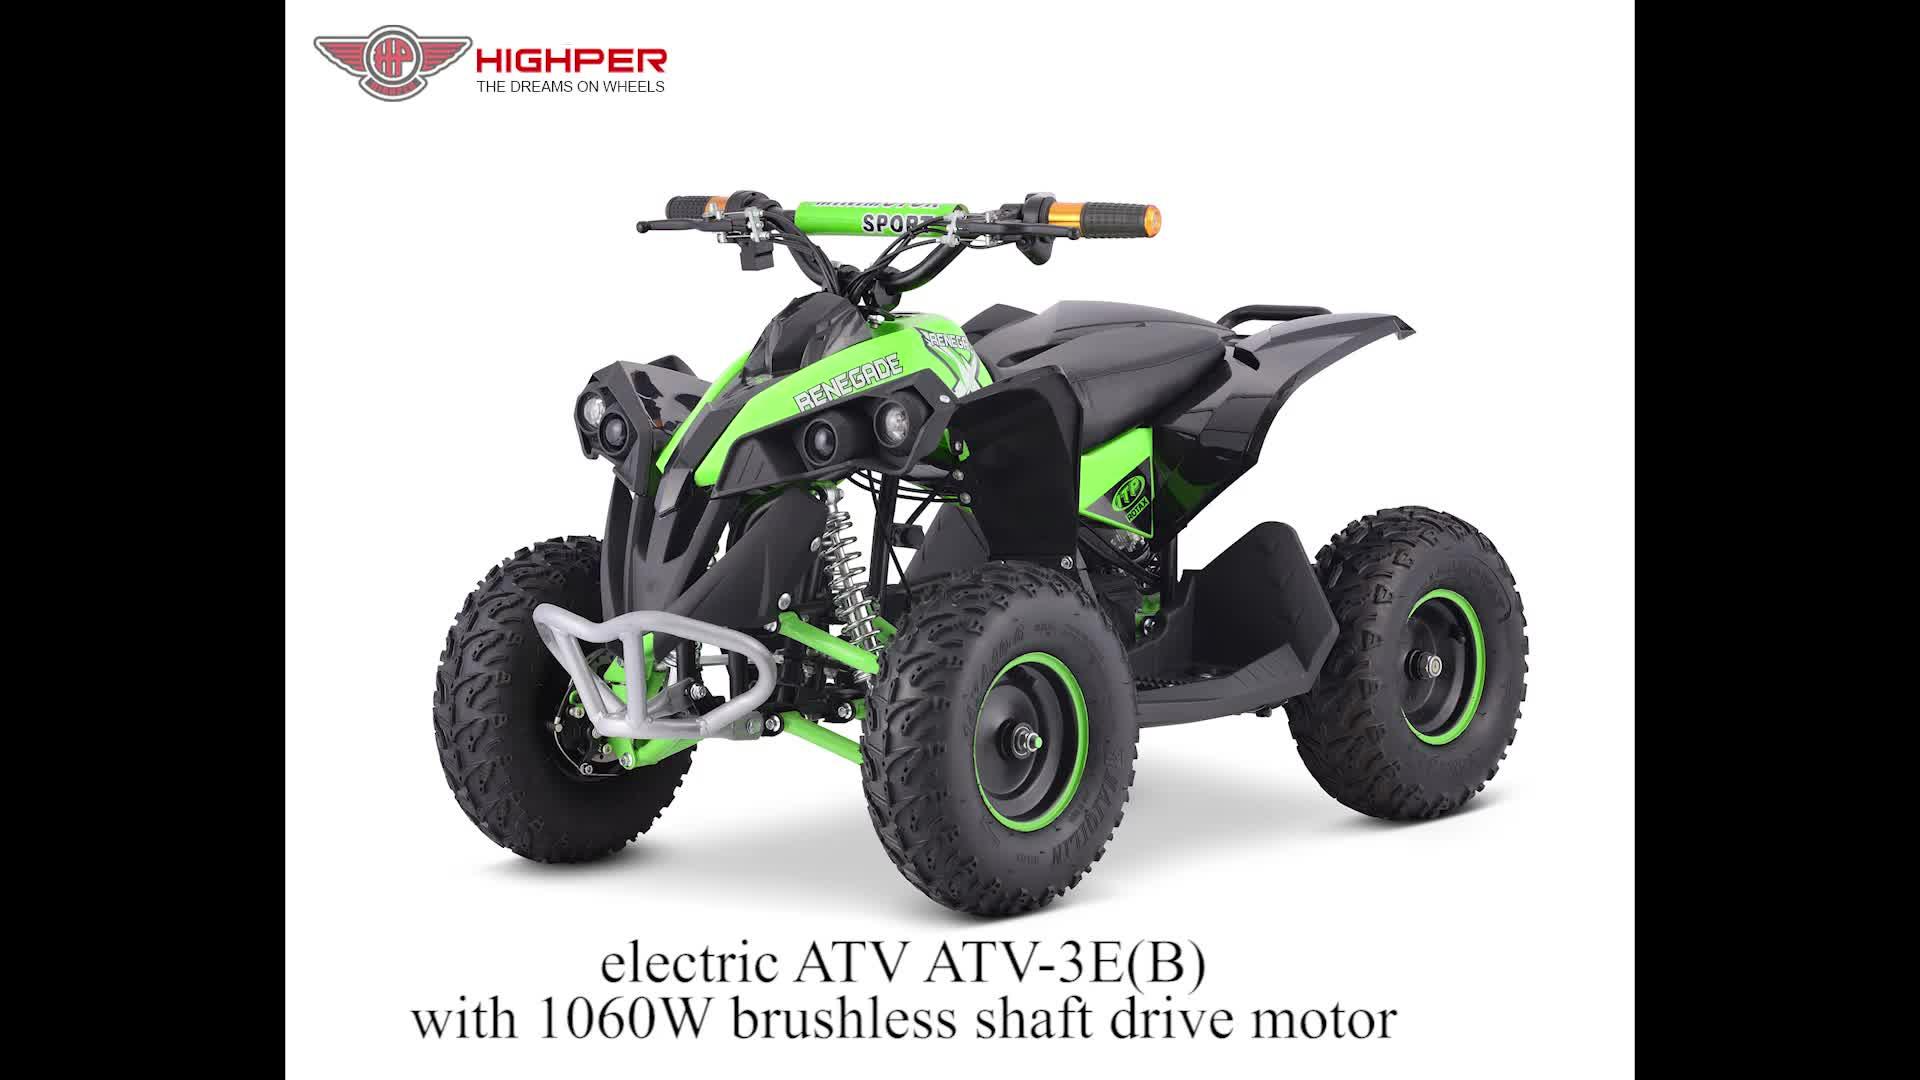 2018 1060W 1200W 36V or 48V Brushless Shaft Drive SPORTS 4 WHEELER  QUAD BIKE ELECTRIC ATV